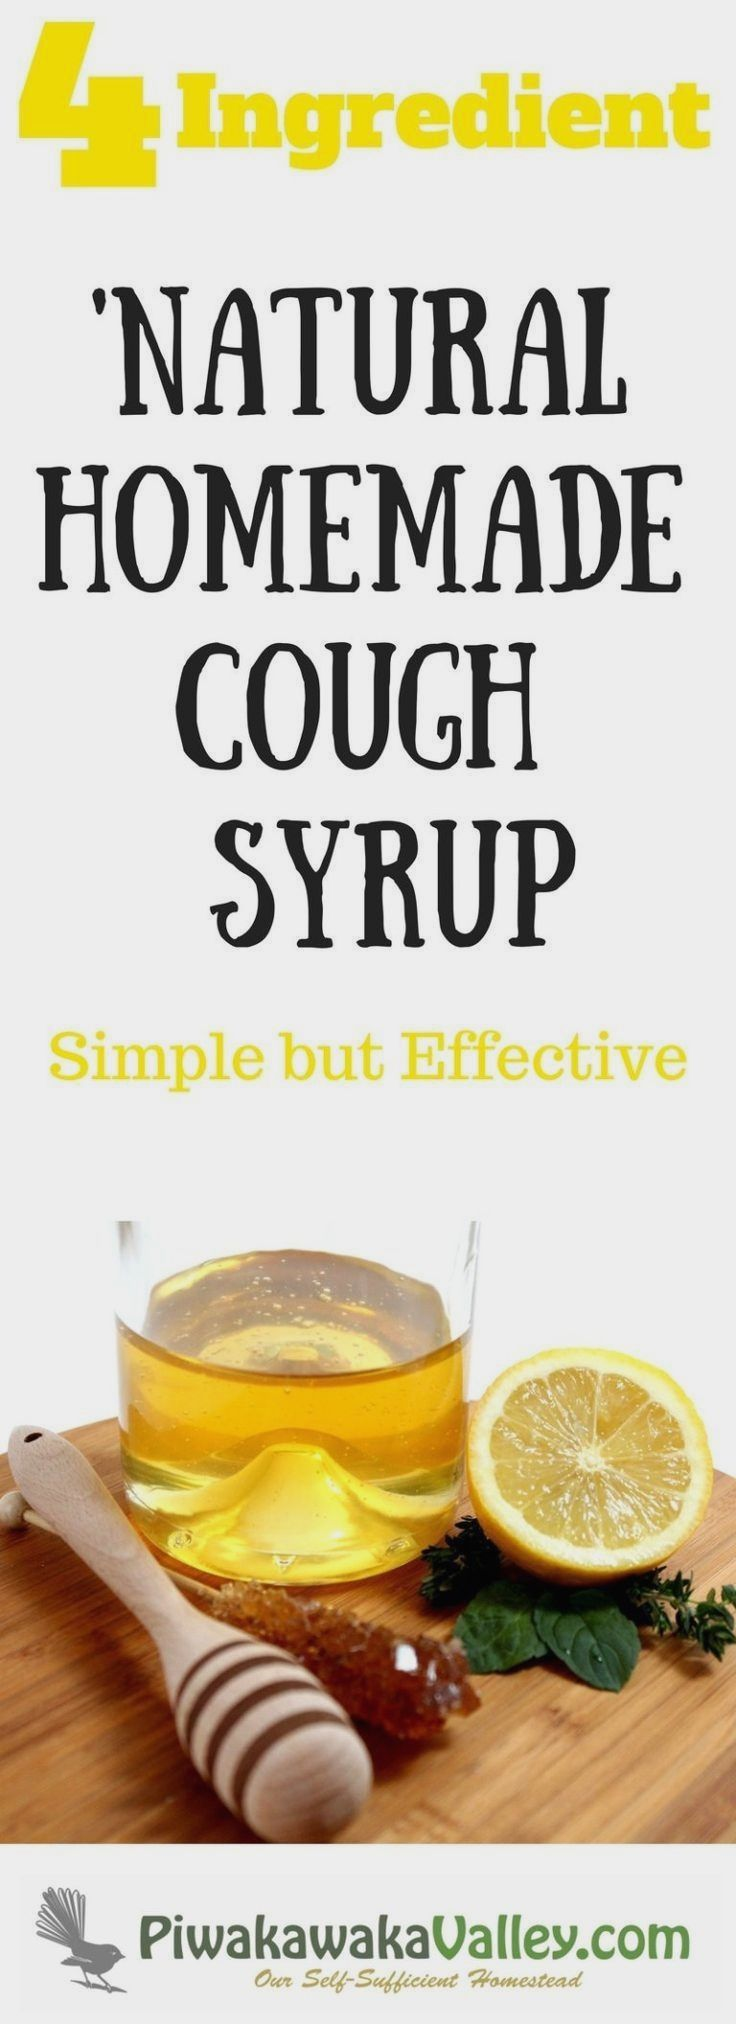 dry cough causes coldremedies cold naturalcoldremedies